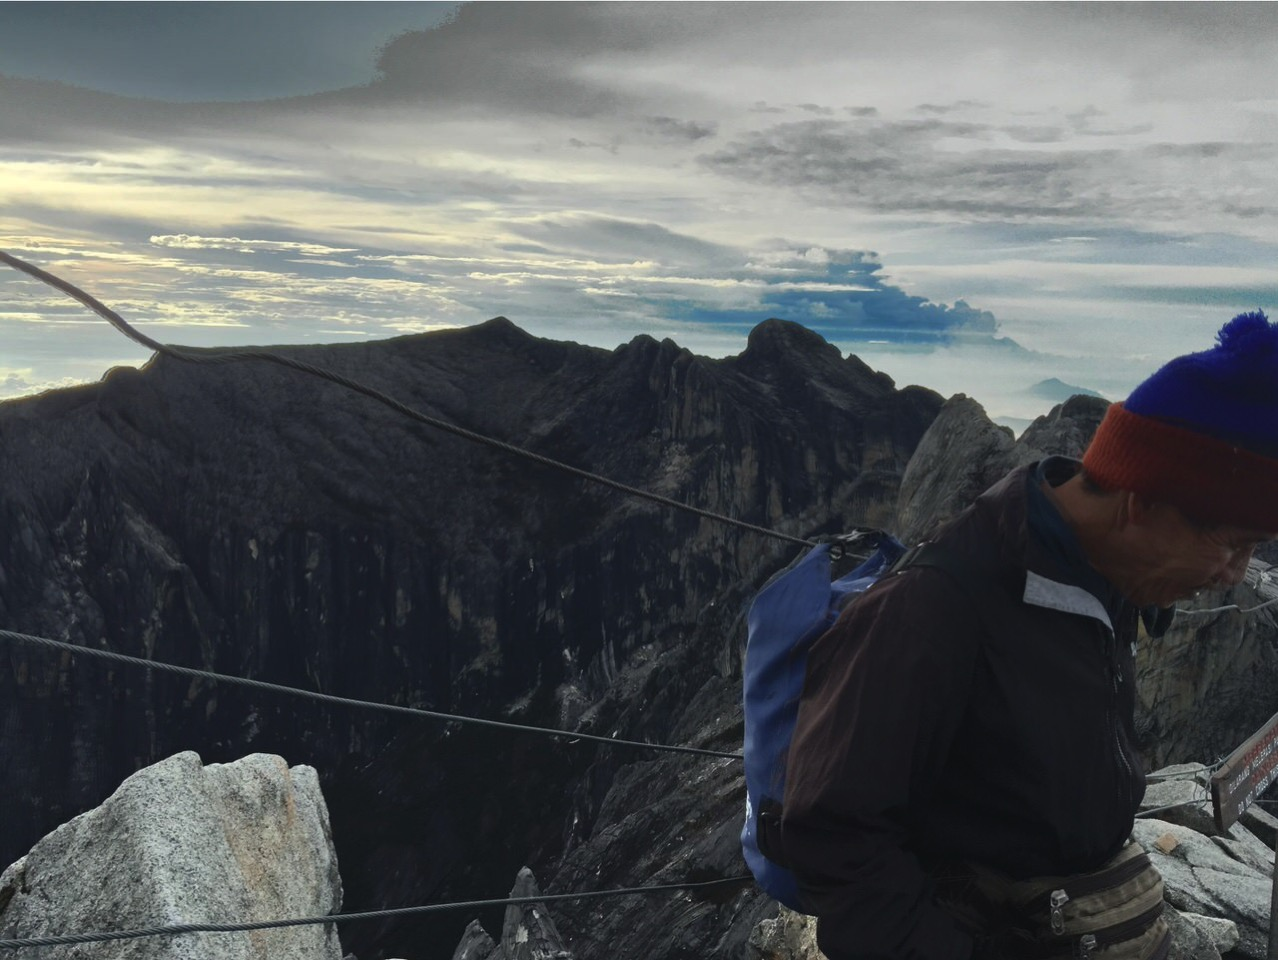 Kota Kinabalu climbing 4161